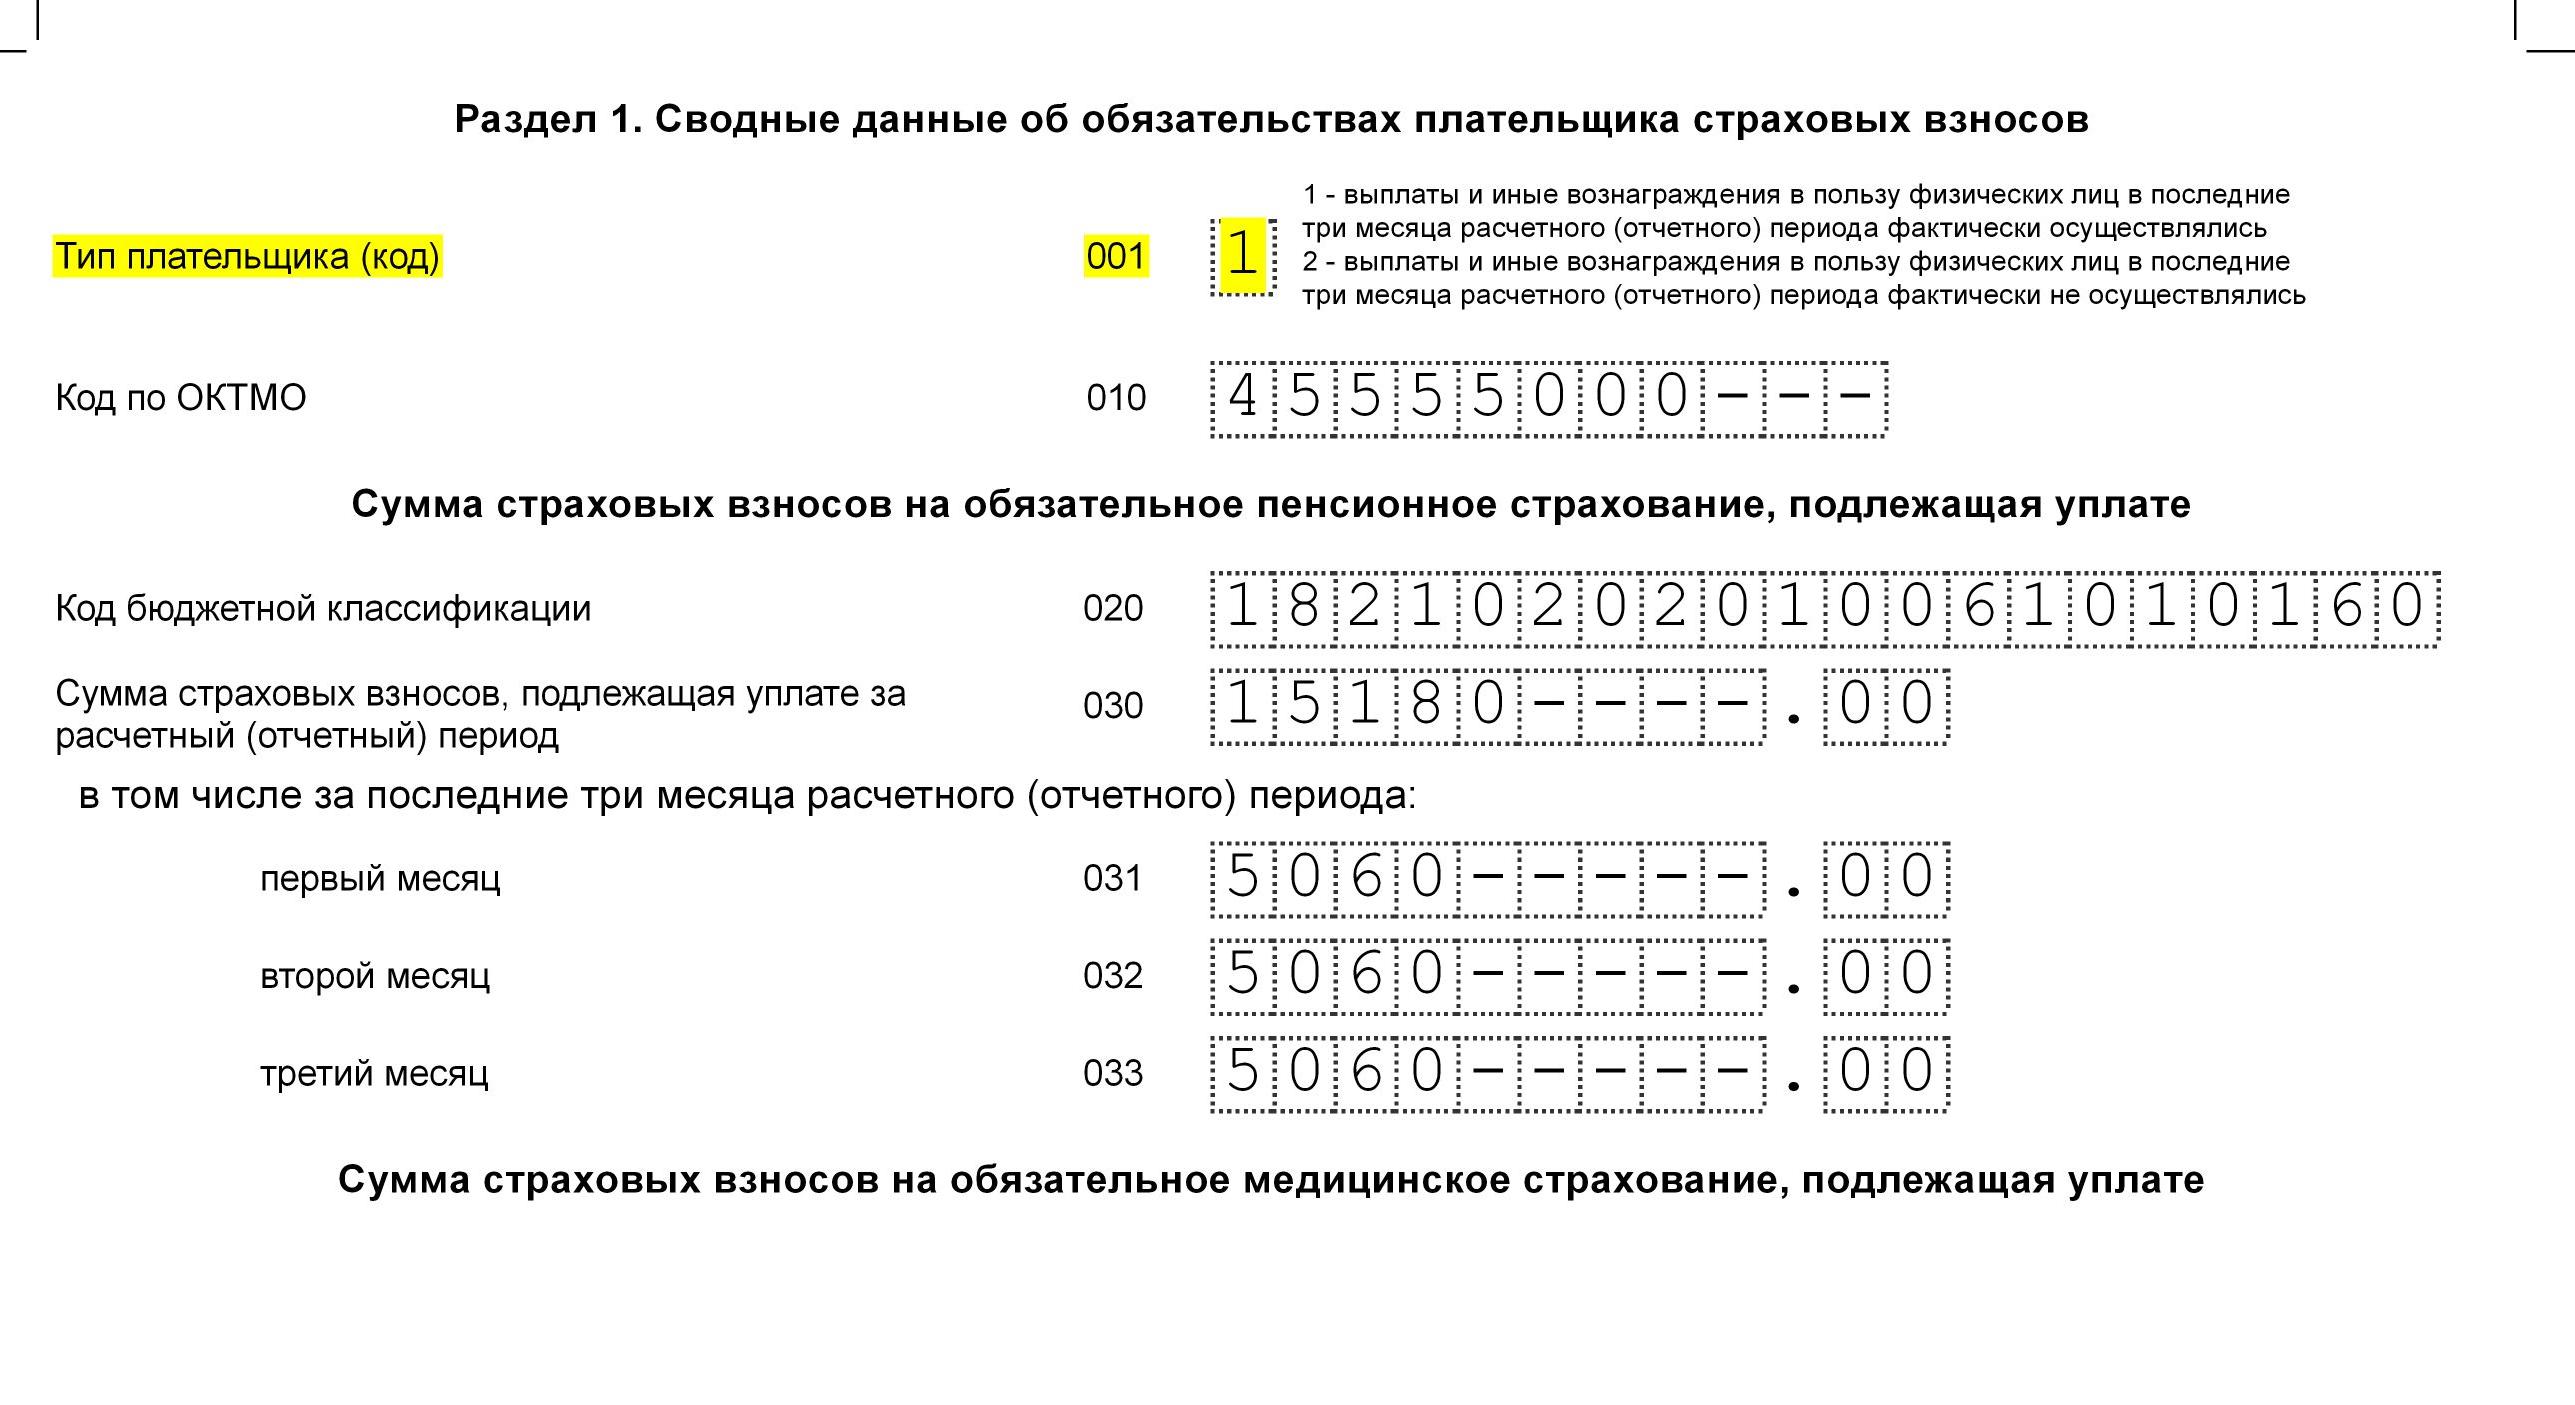 Форма РСВ Раздел 1